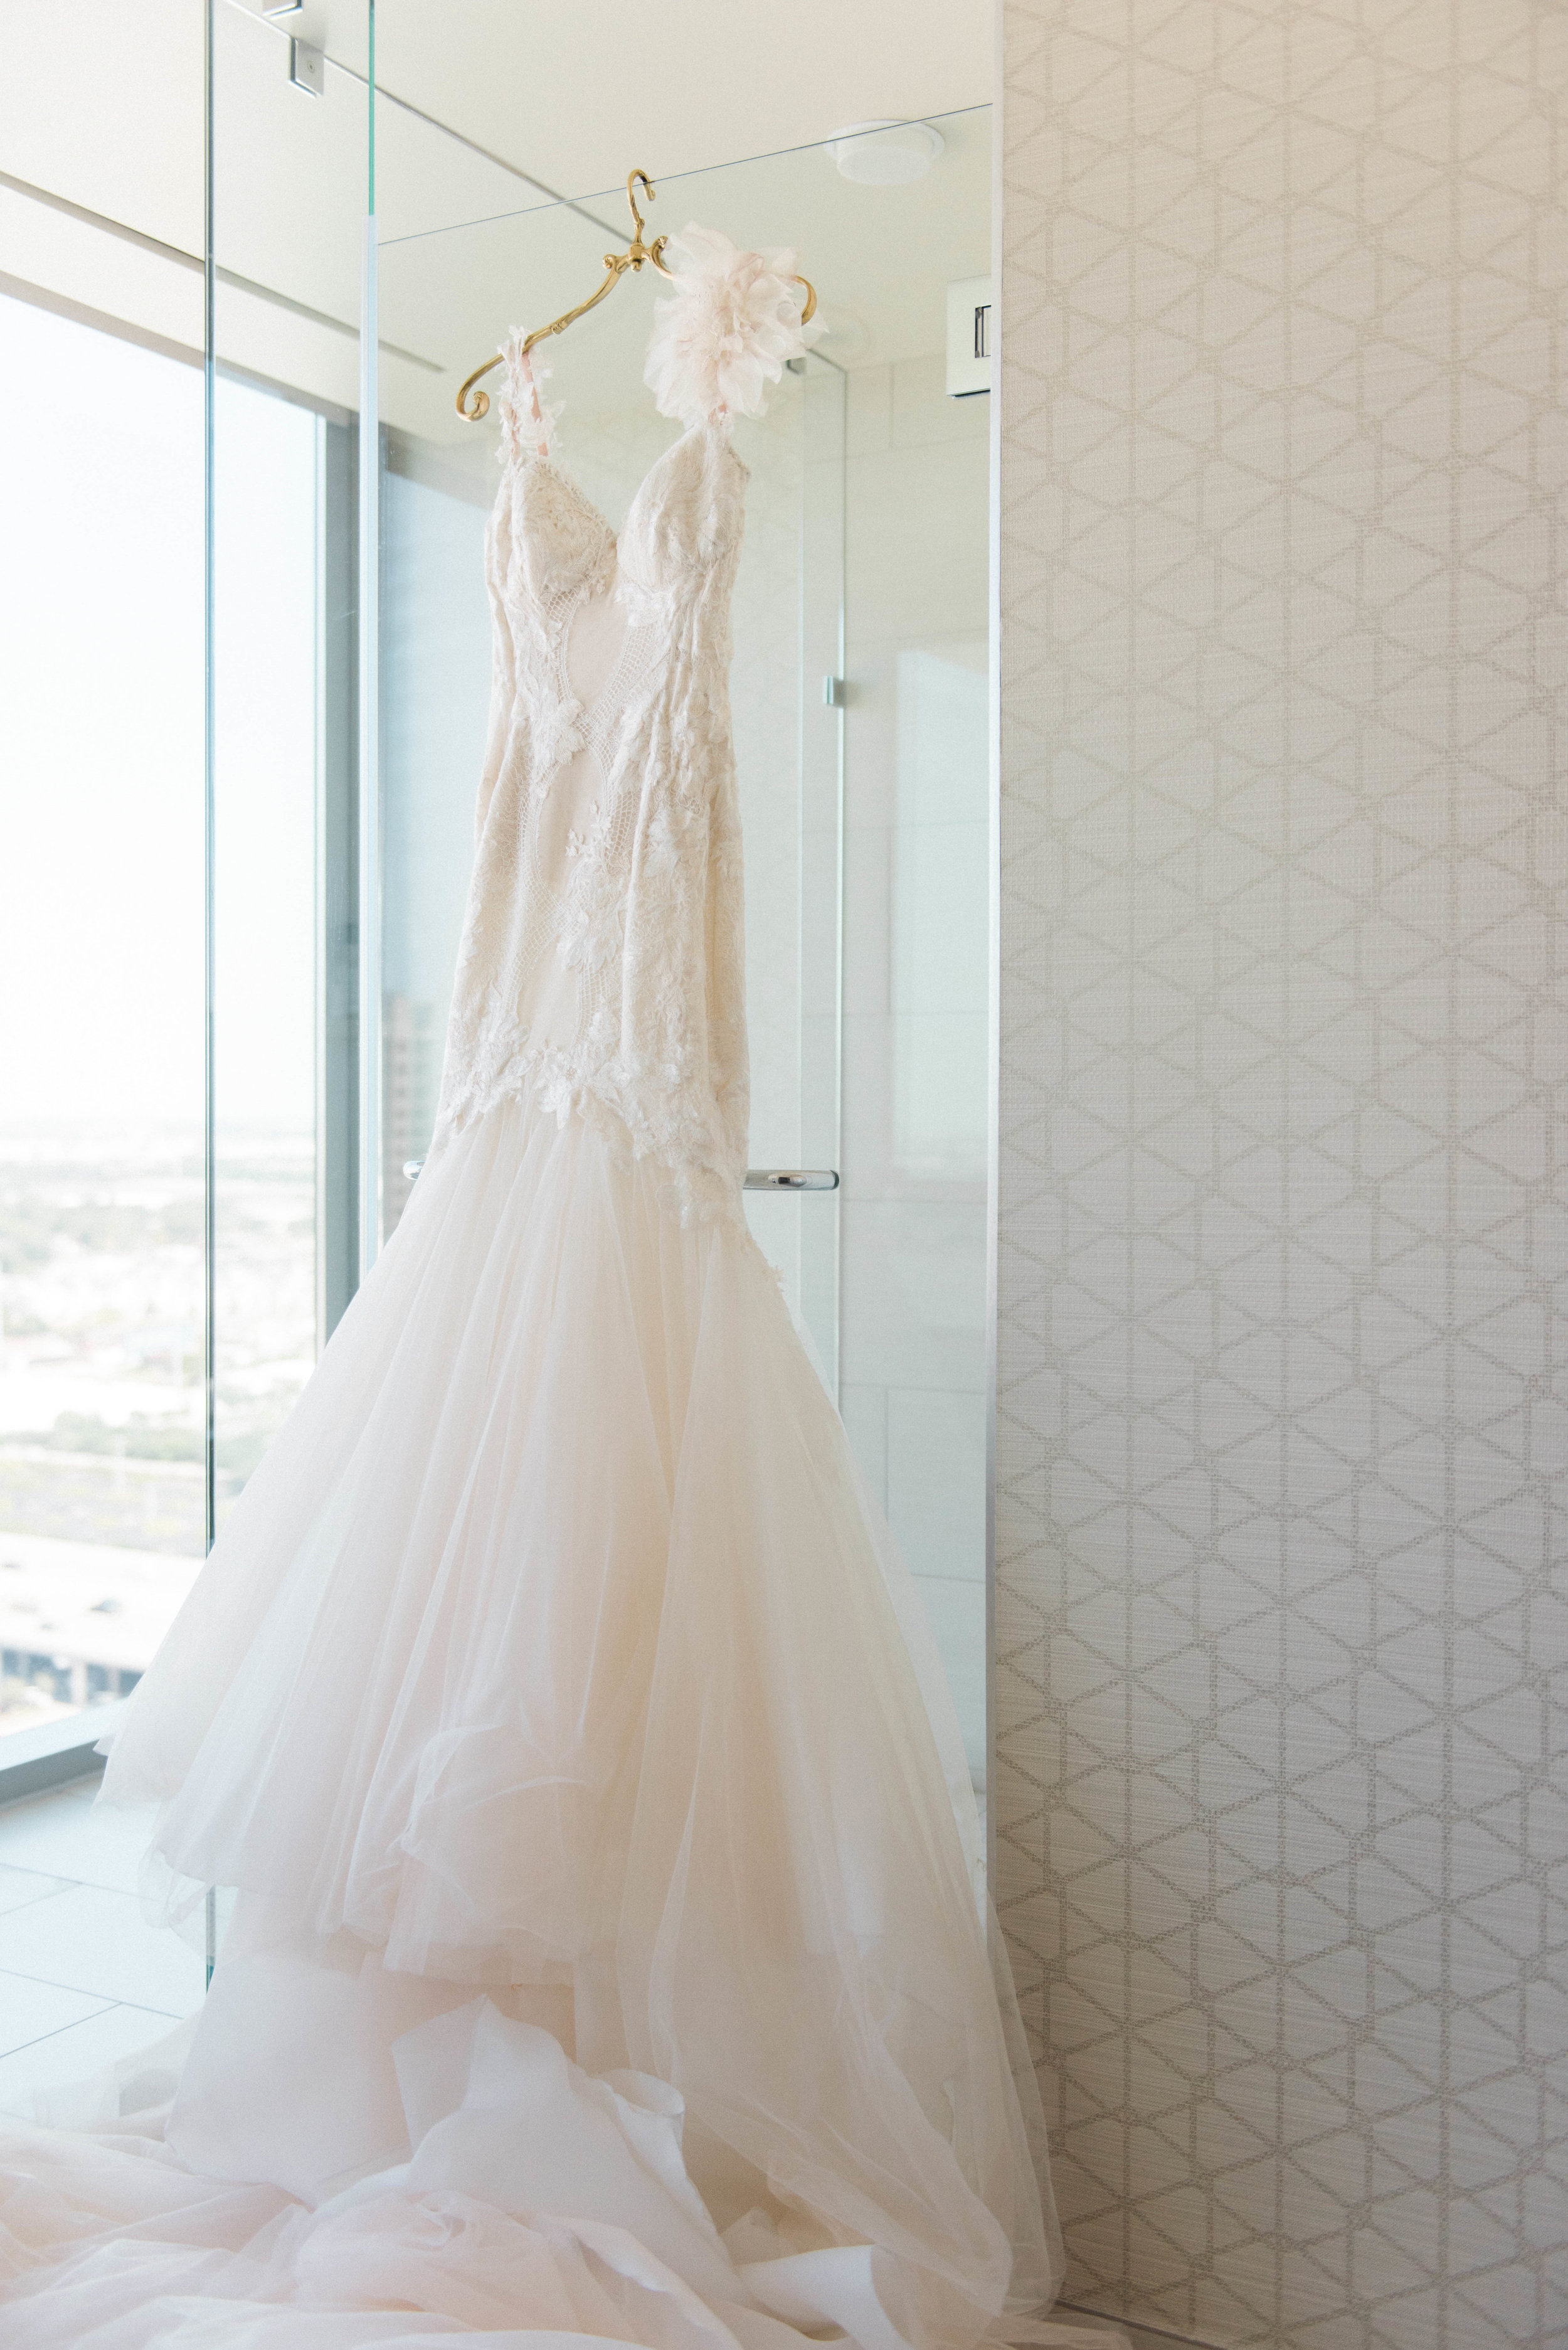 Martha-Stewart-Wedding-Dana-Fernandez-Photography-Josh-Texas-Film-Houston-Wedding-Fine-Art-Photographer-McGovern-Centennial-Gardens-Top-Best-144.jpg